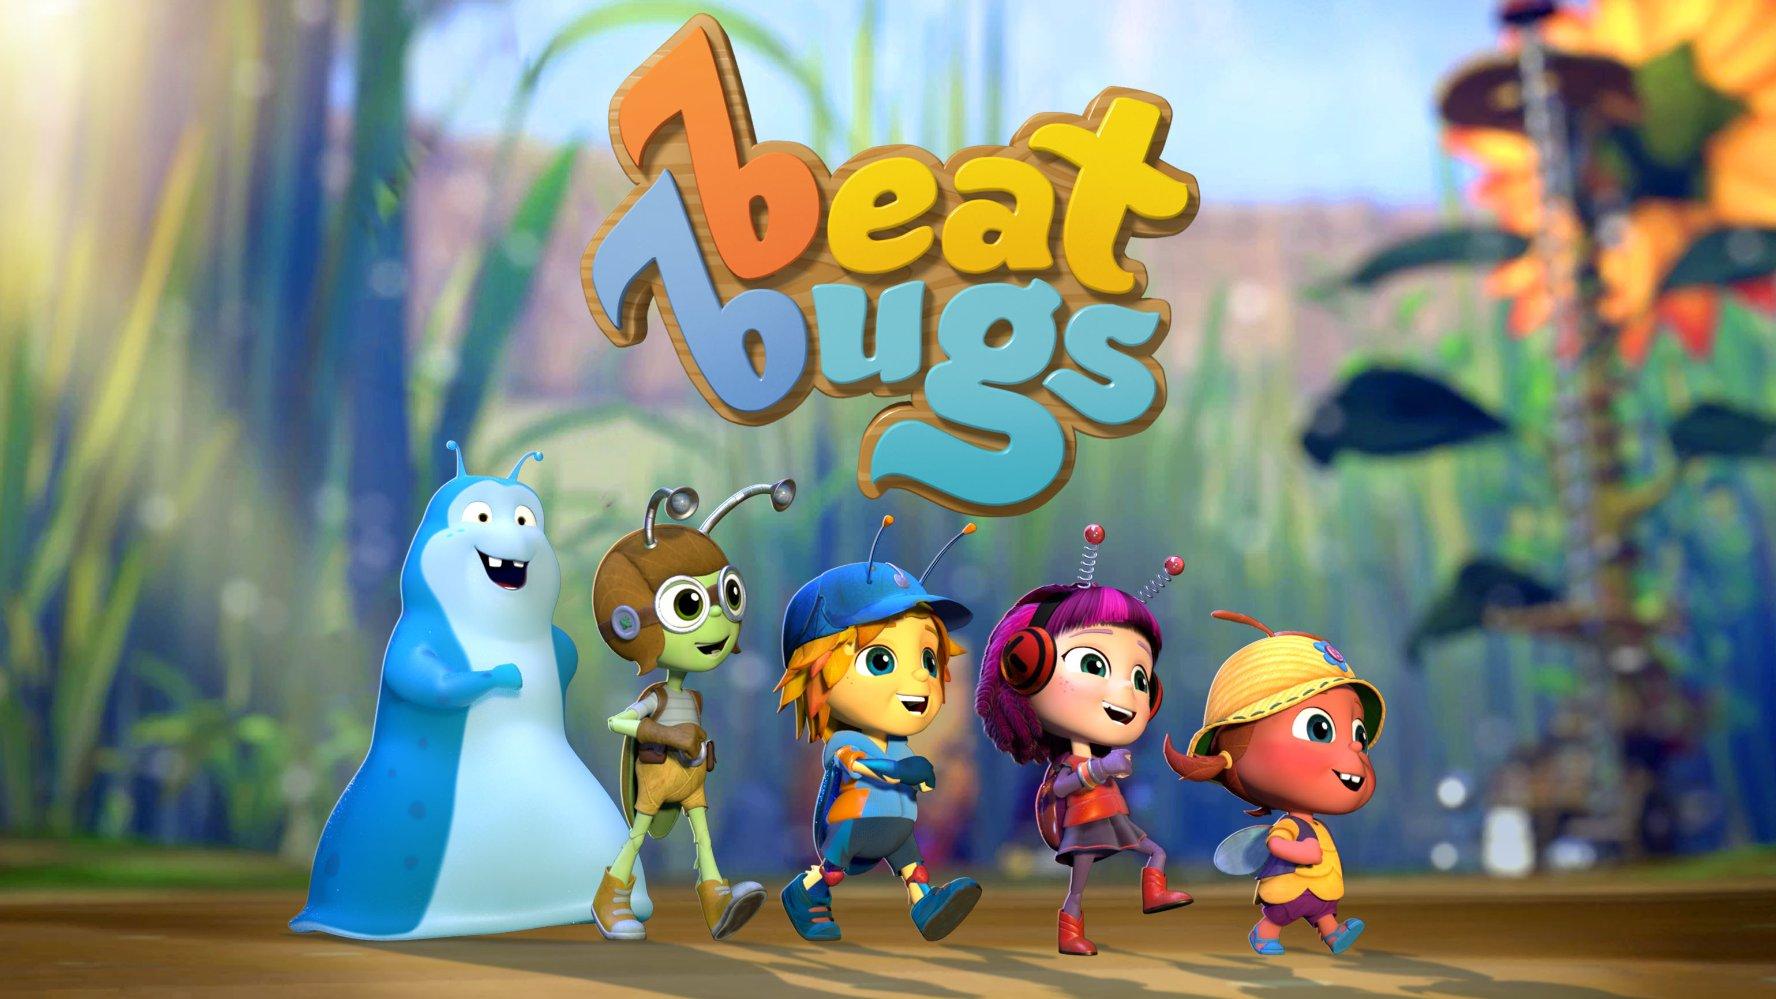 Beat Bugs Season 3 1